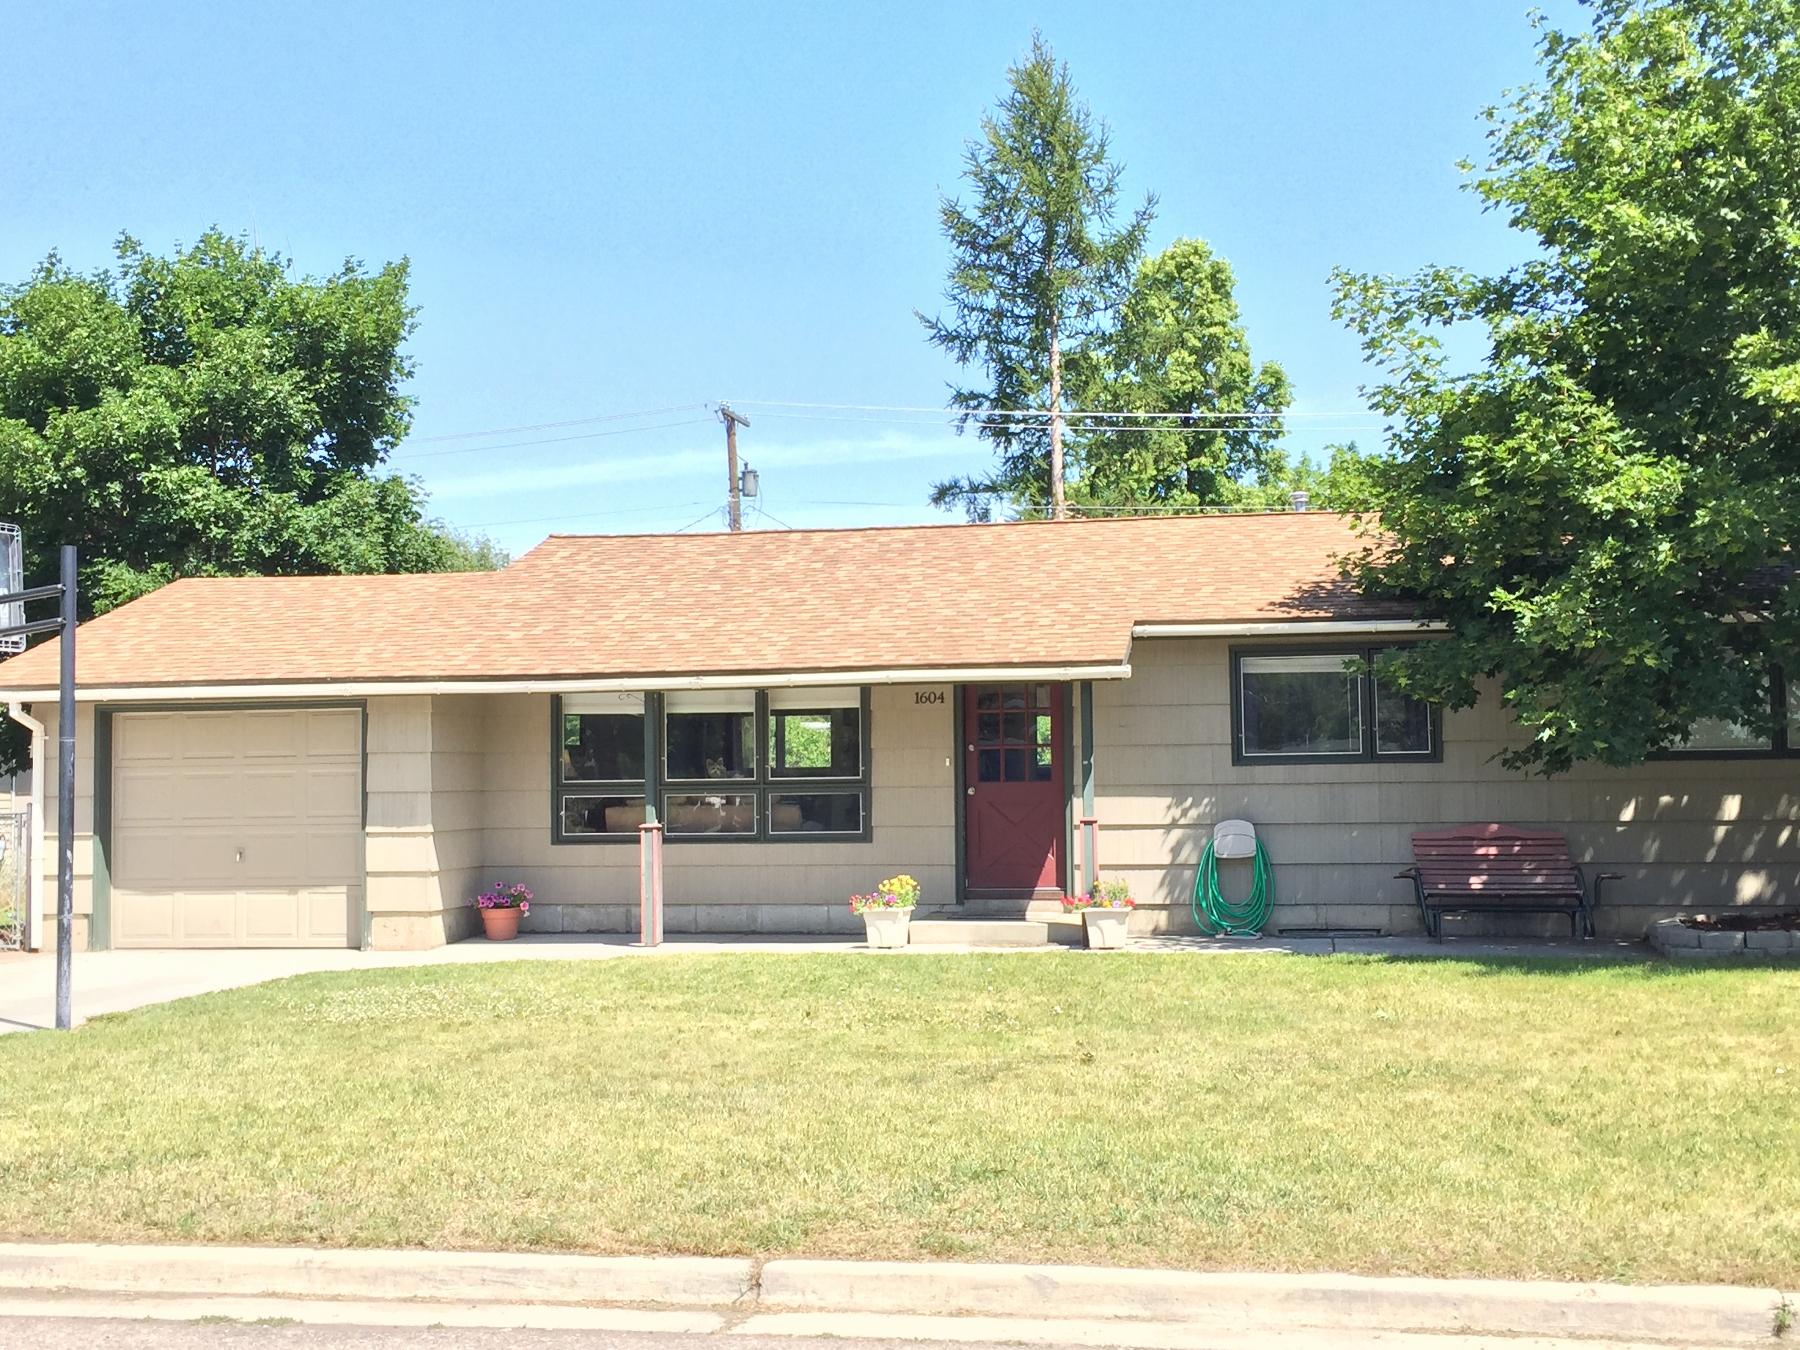 Vivienda unifamiliar por un Venta en 1604 Charlott Ave Missoula, Montana 59801 Estados Unidos